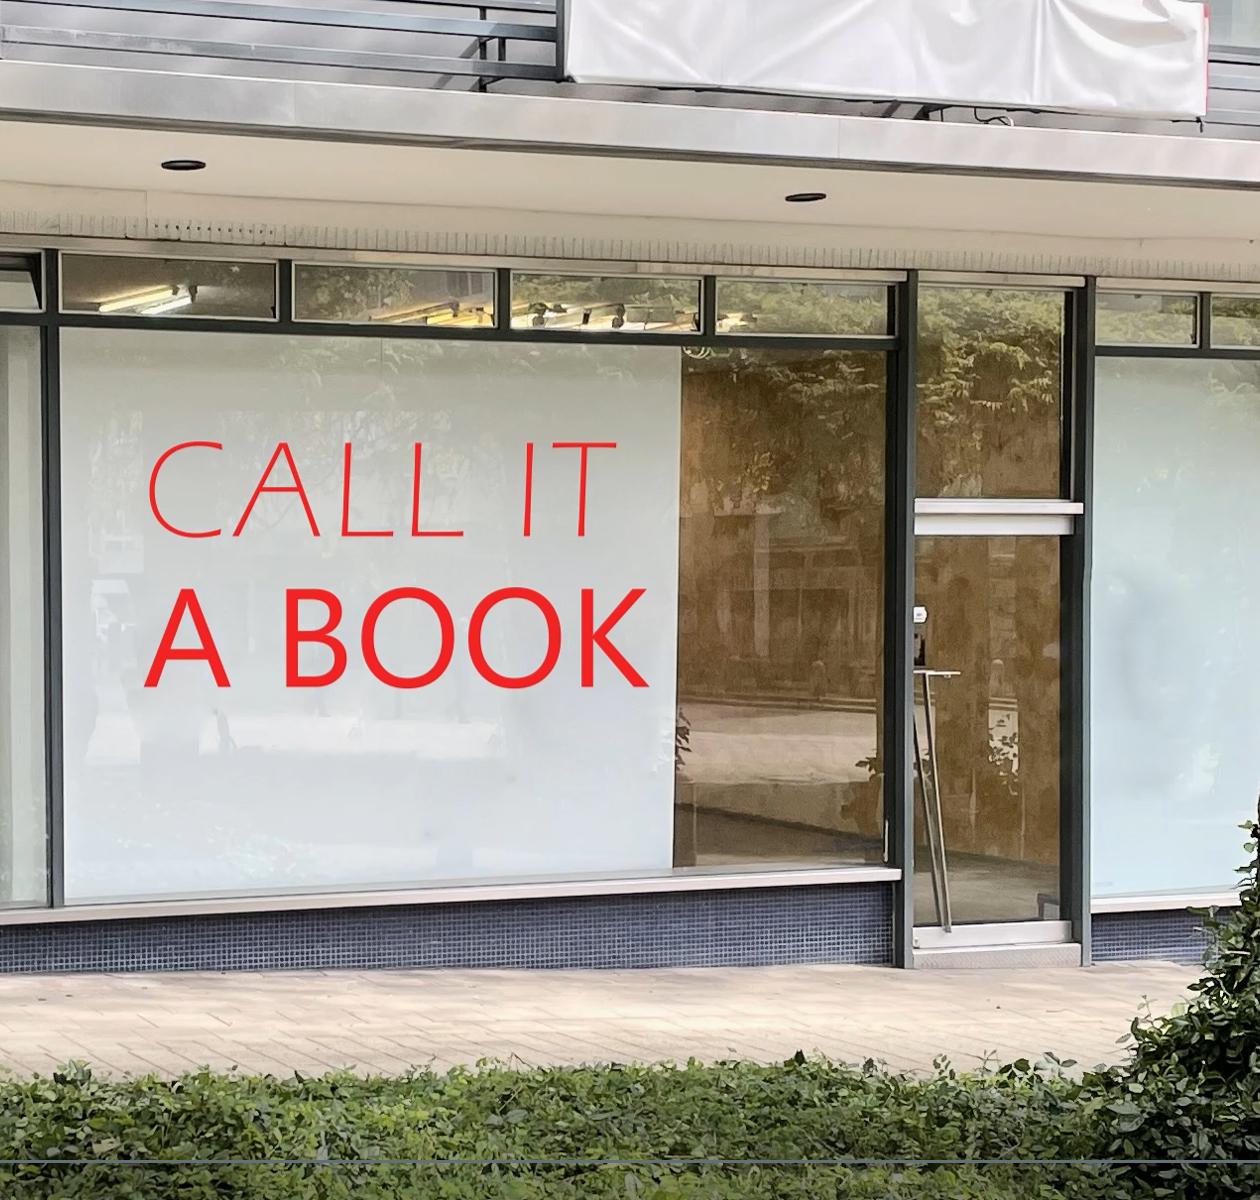 Call it a book at KOP12, Essen